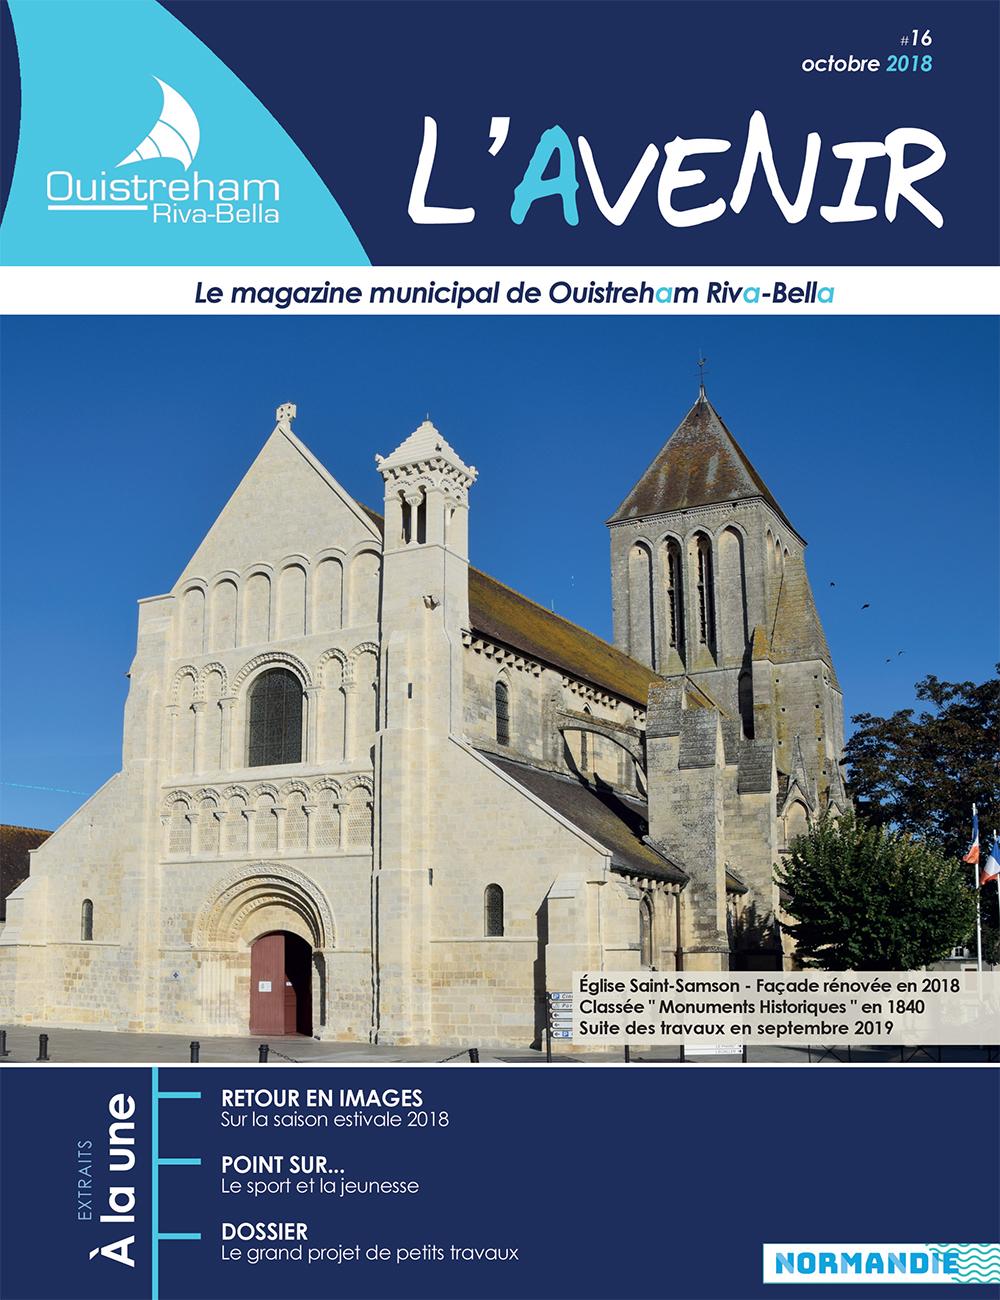 Magazine municipal - L'Avenir n°16 - Ouistreham Riva-Bella - octobre 2018